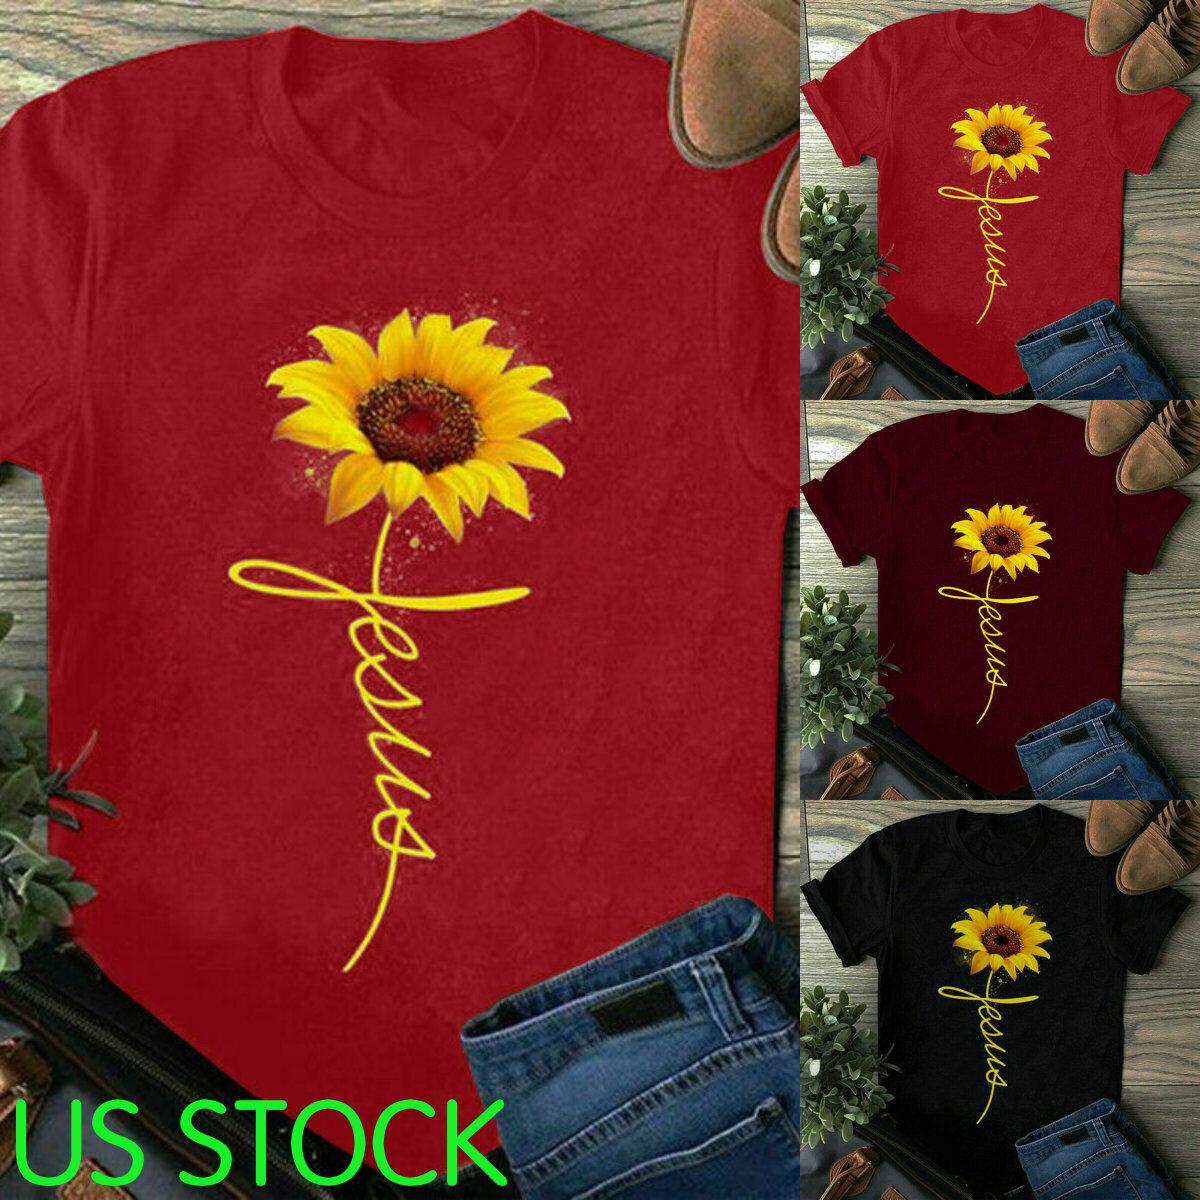 womens tops sunflower printed faith t shirt